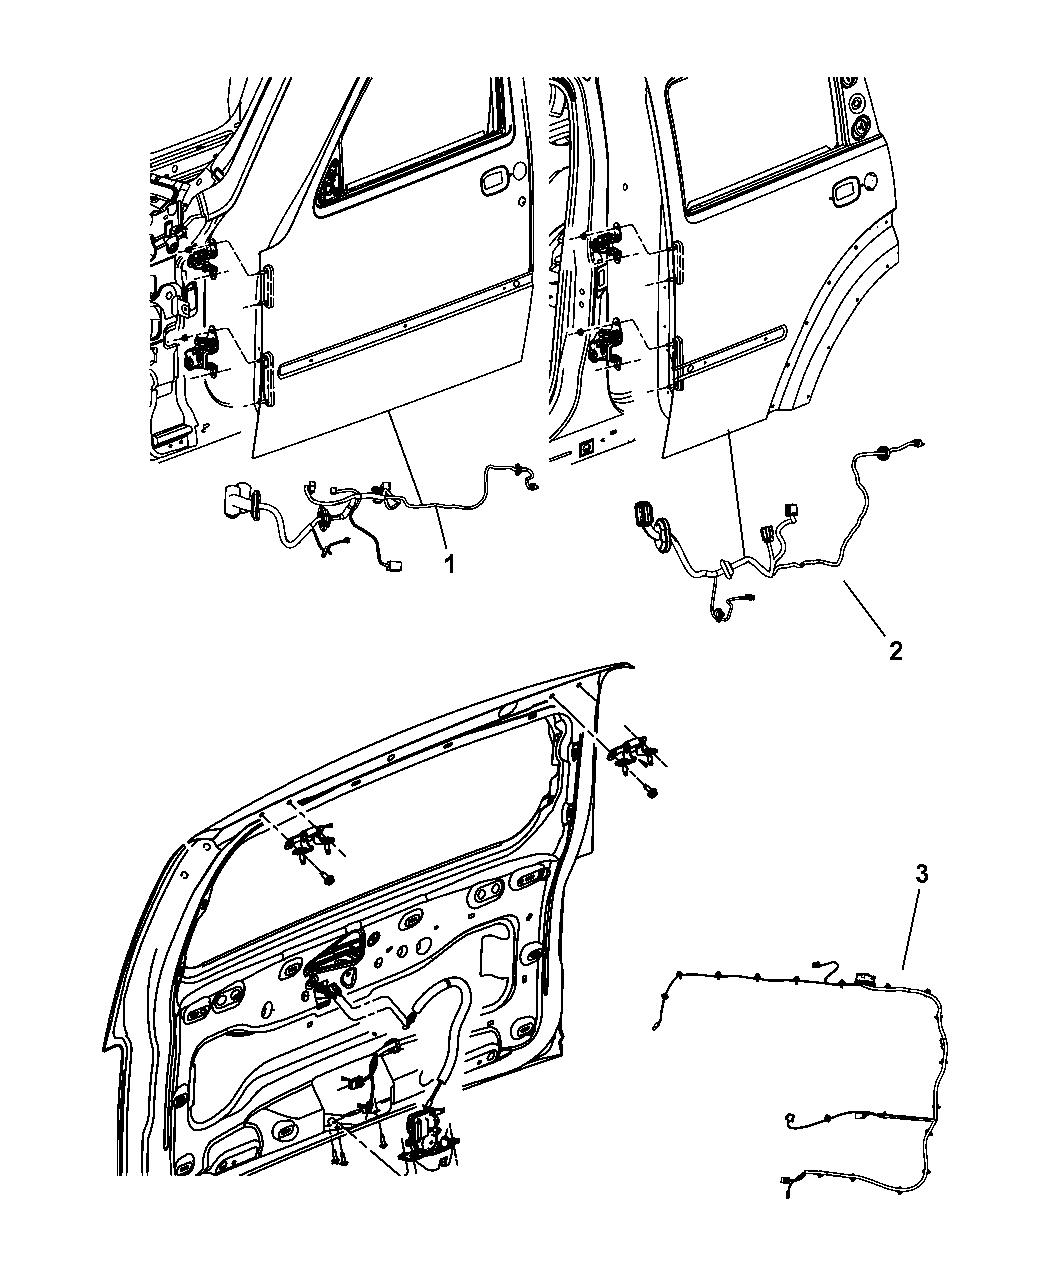 68061553aa Genuine Dodge Wiring Rear Door Nitro 2010 Deck Lid And Liftgate